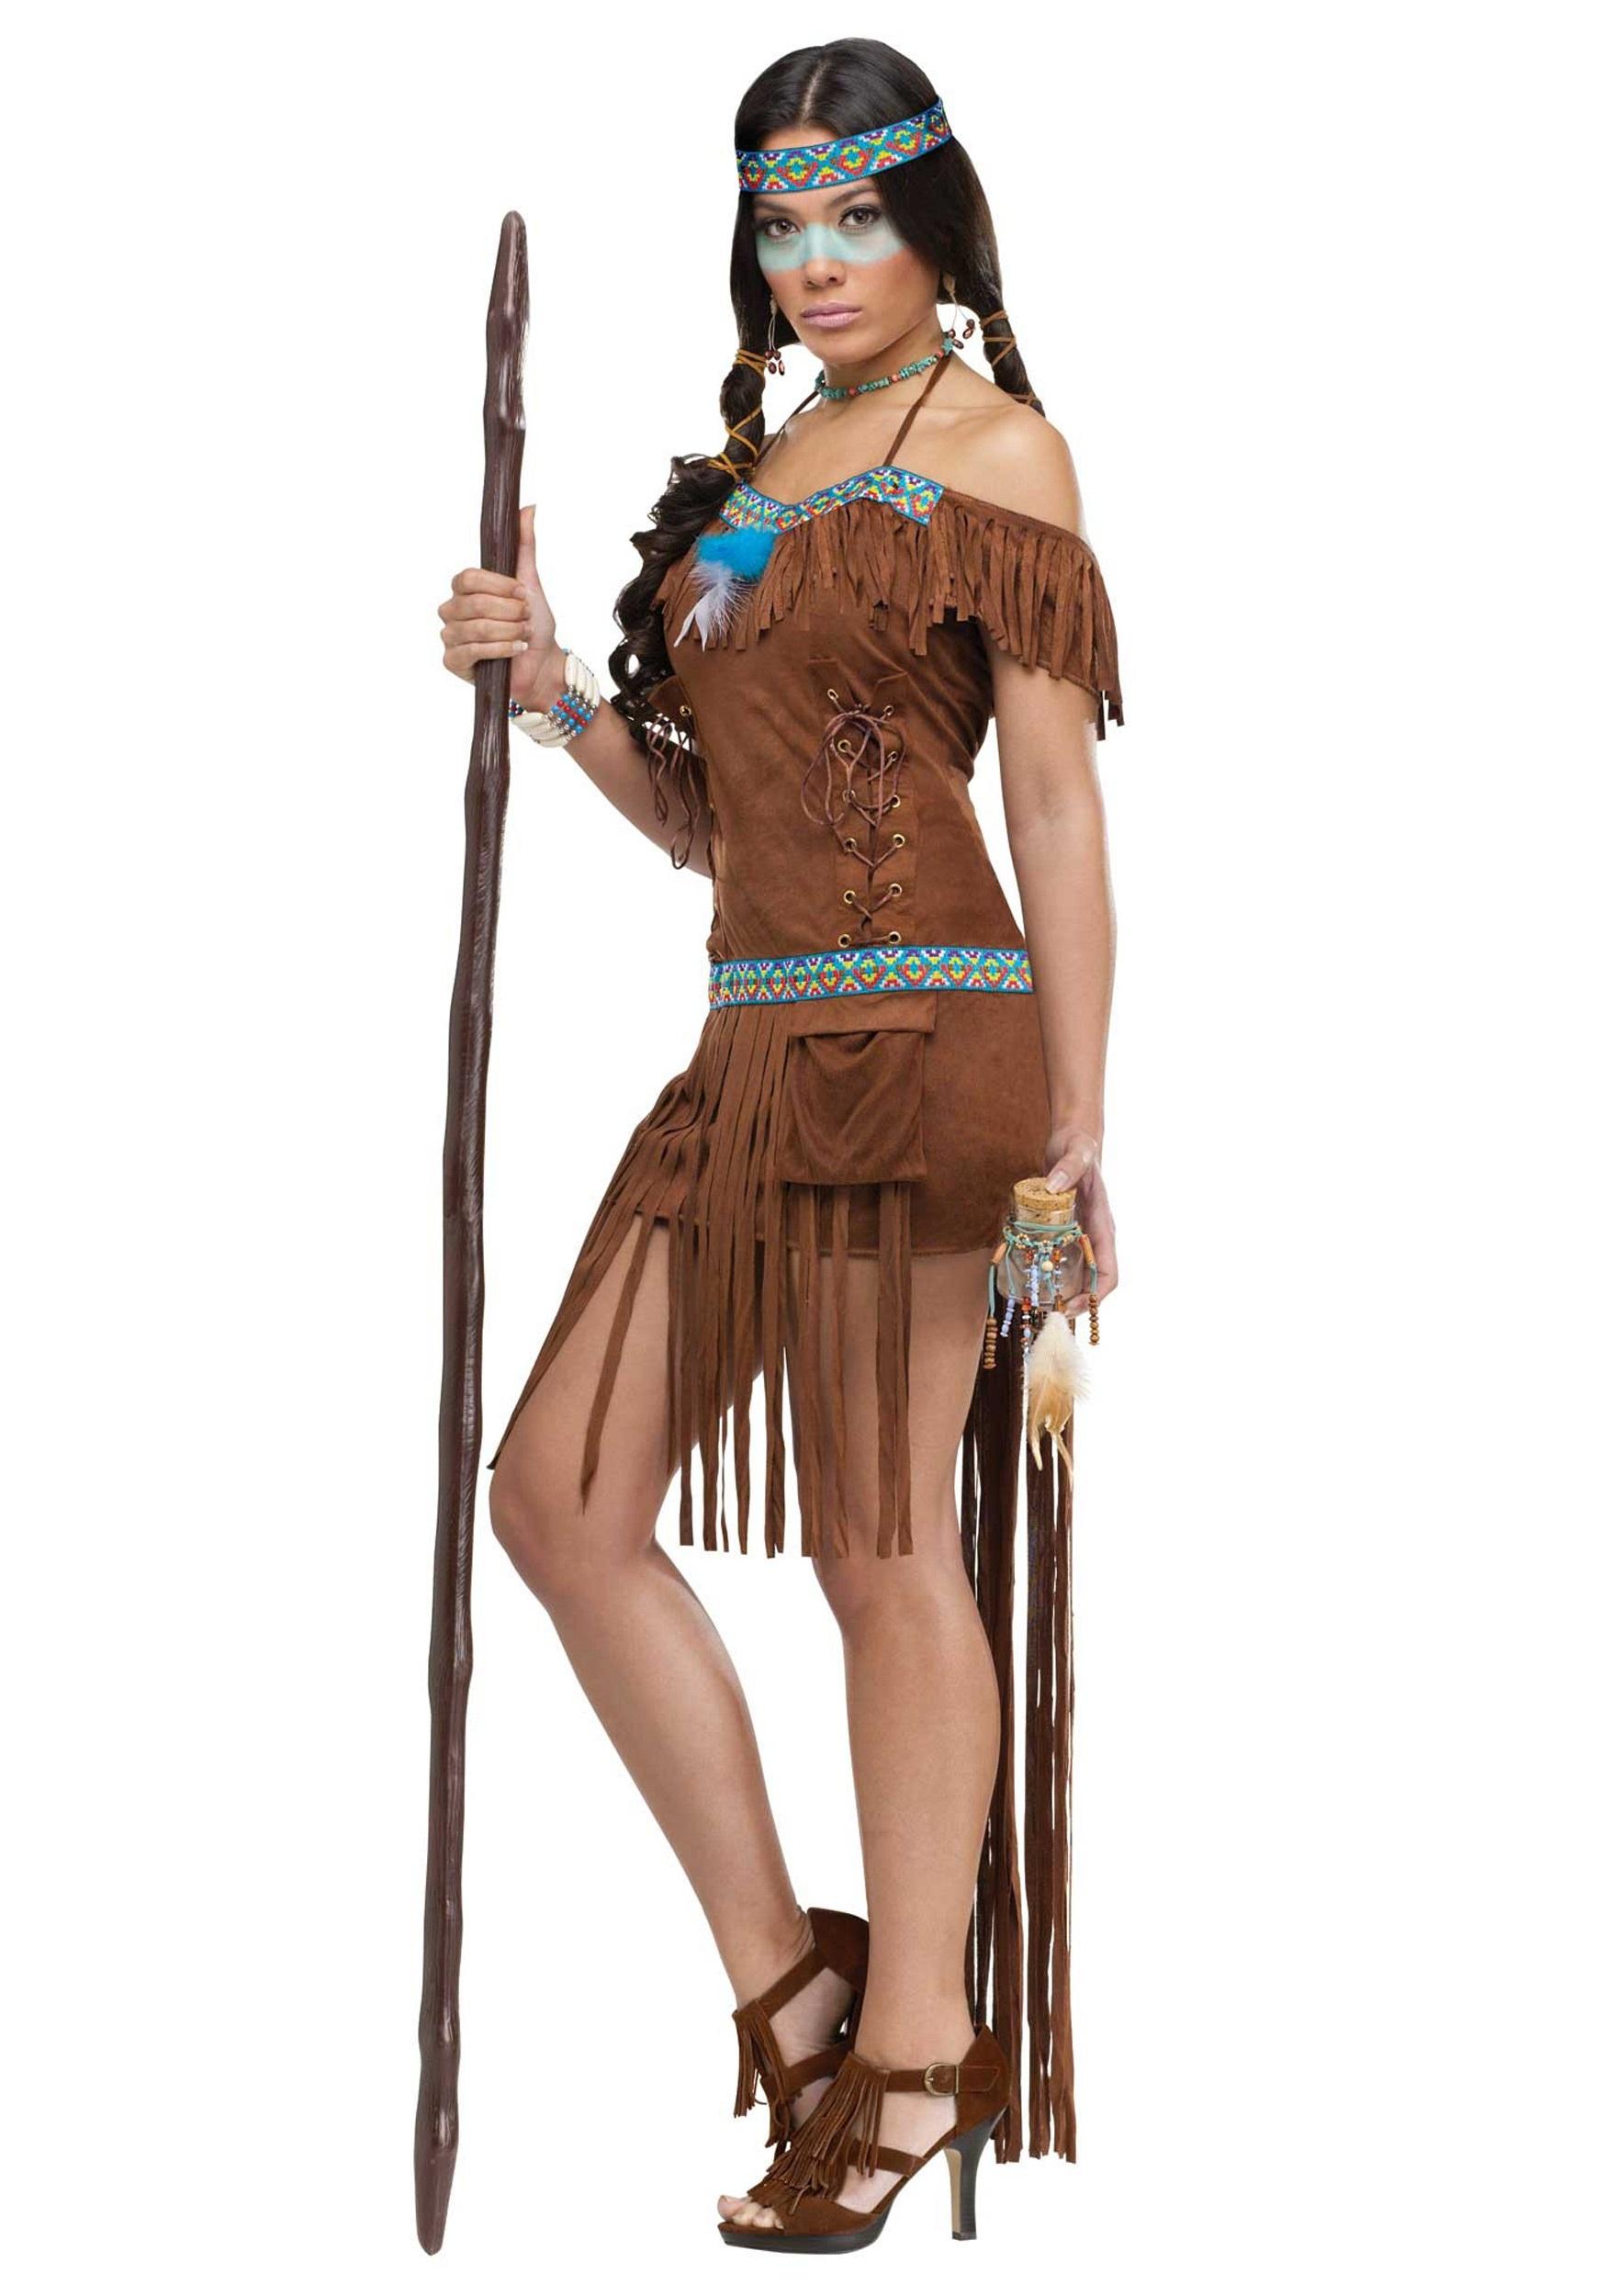 a102bf99e23 Women's Native American Healer Costume